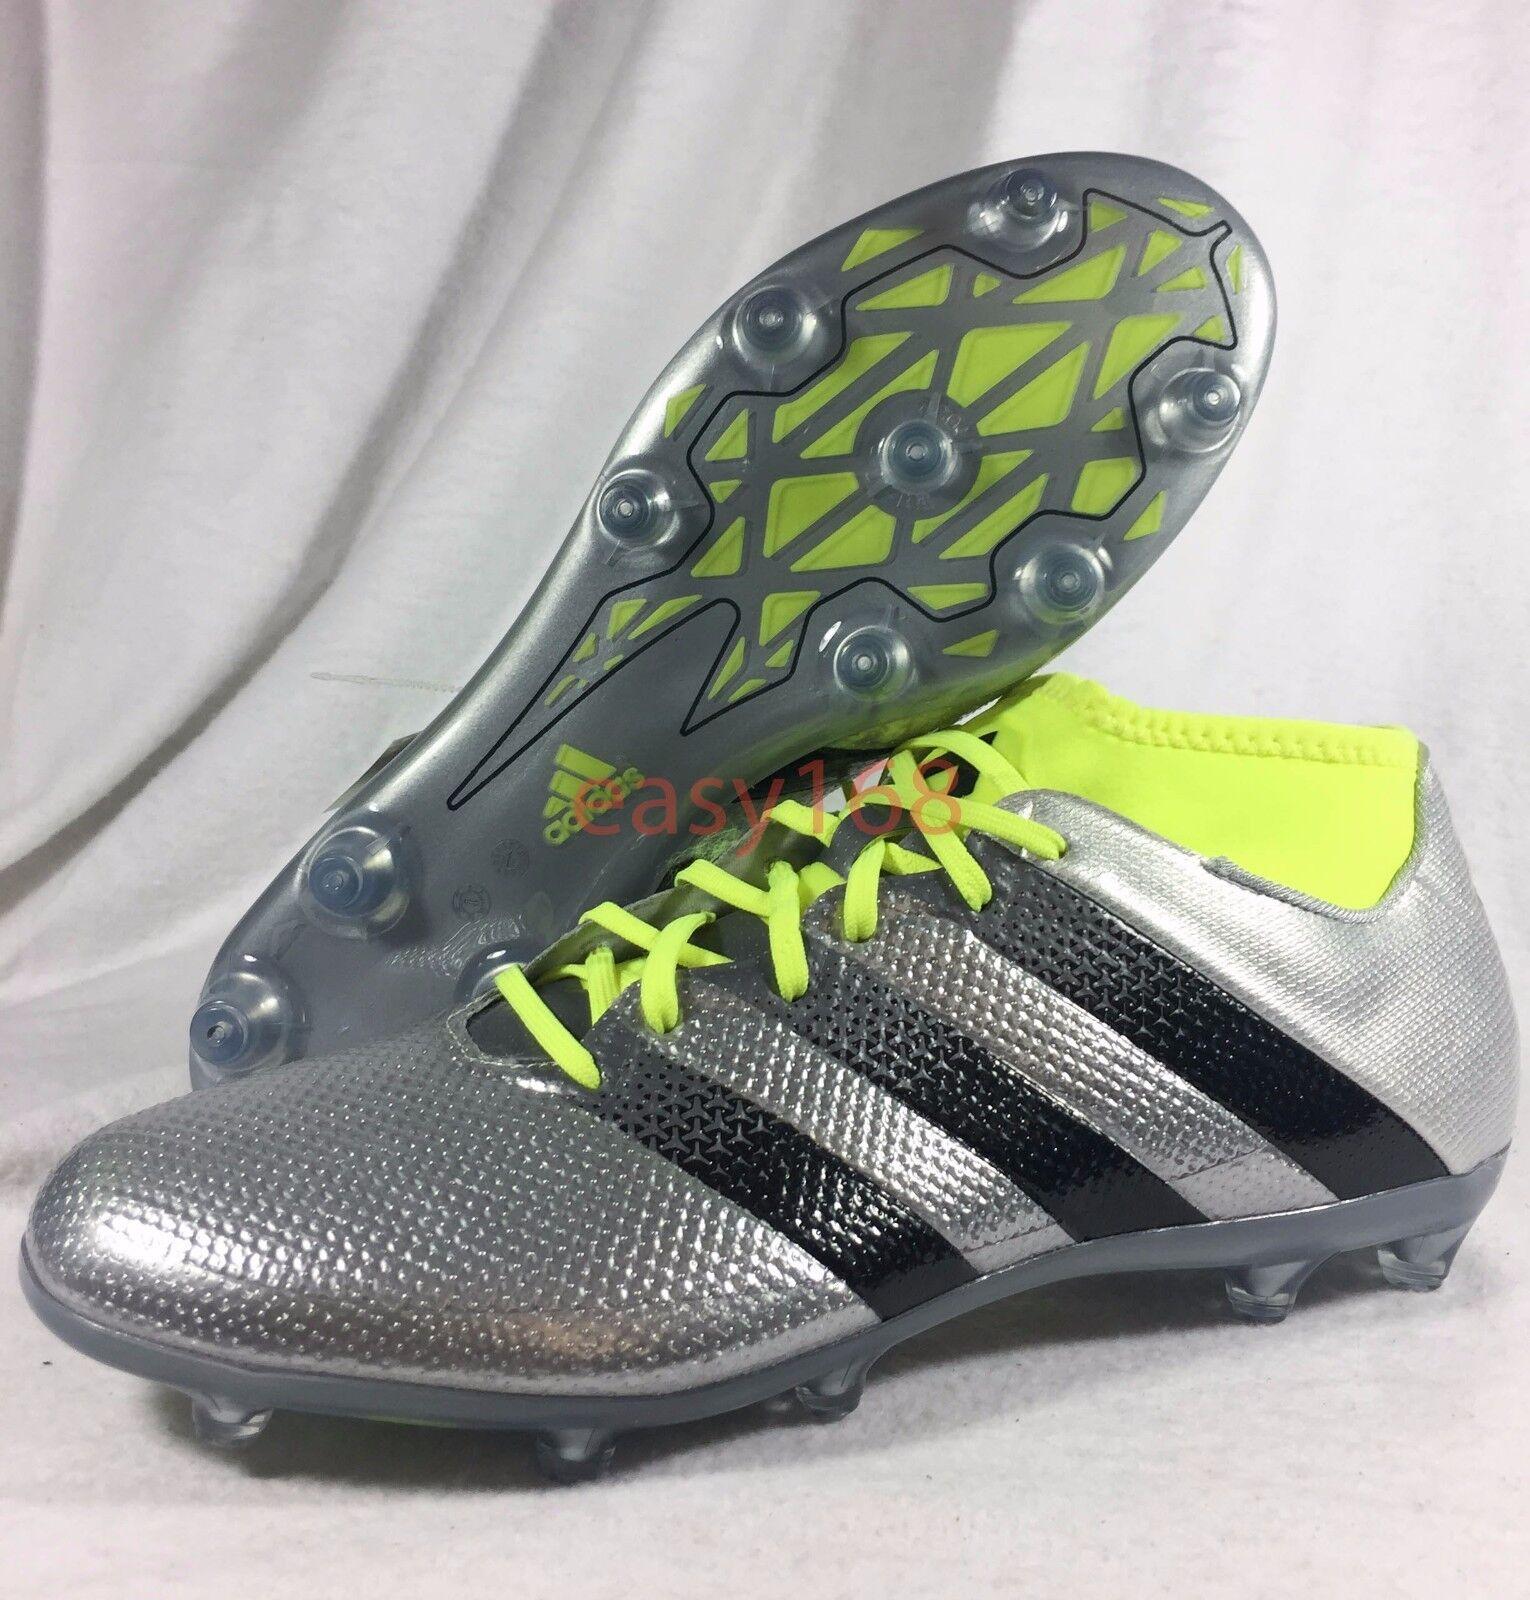 NEW ADIDAS Ace 16.2 Primemesh FG AG Sz 10.5 Mens Soccer Cleats Silver AQ3448